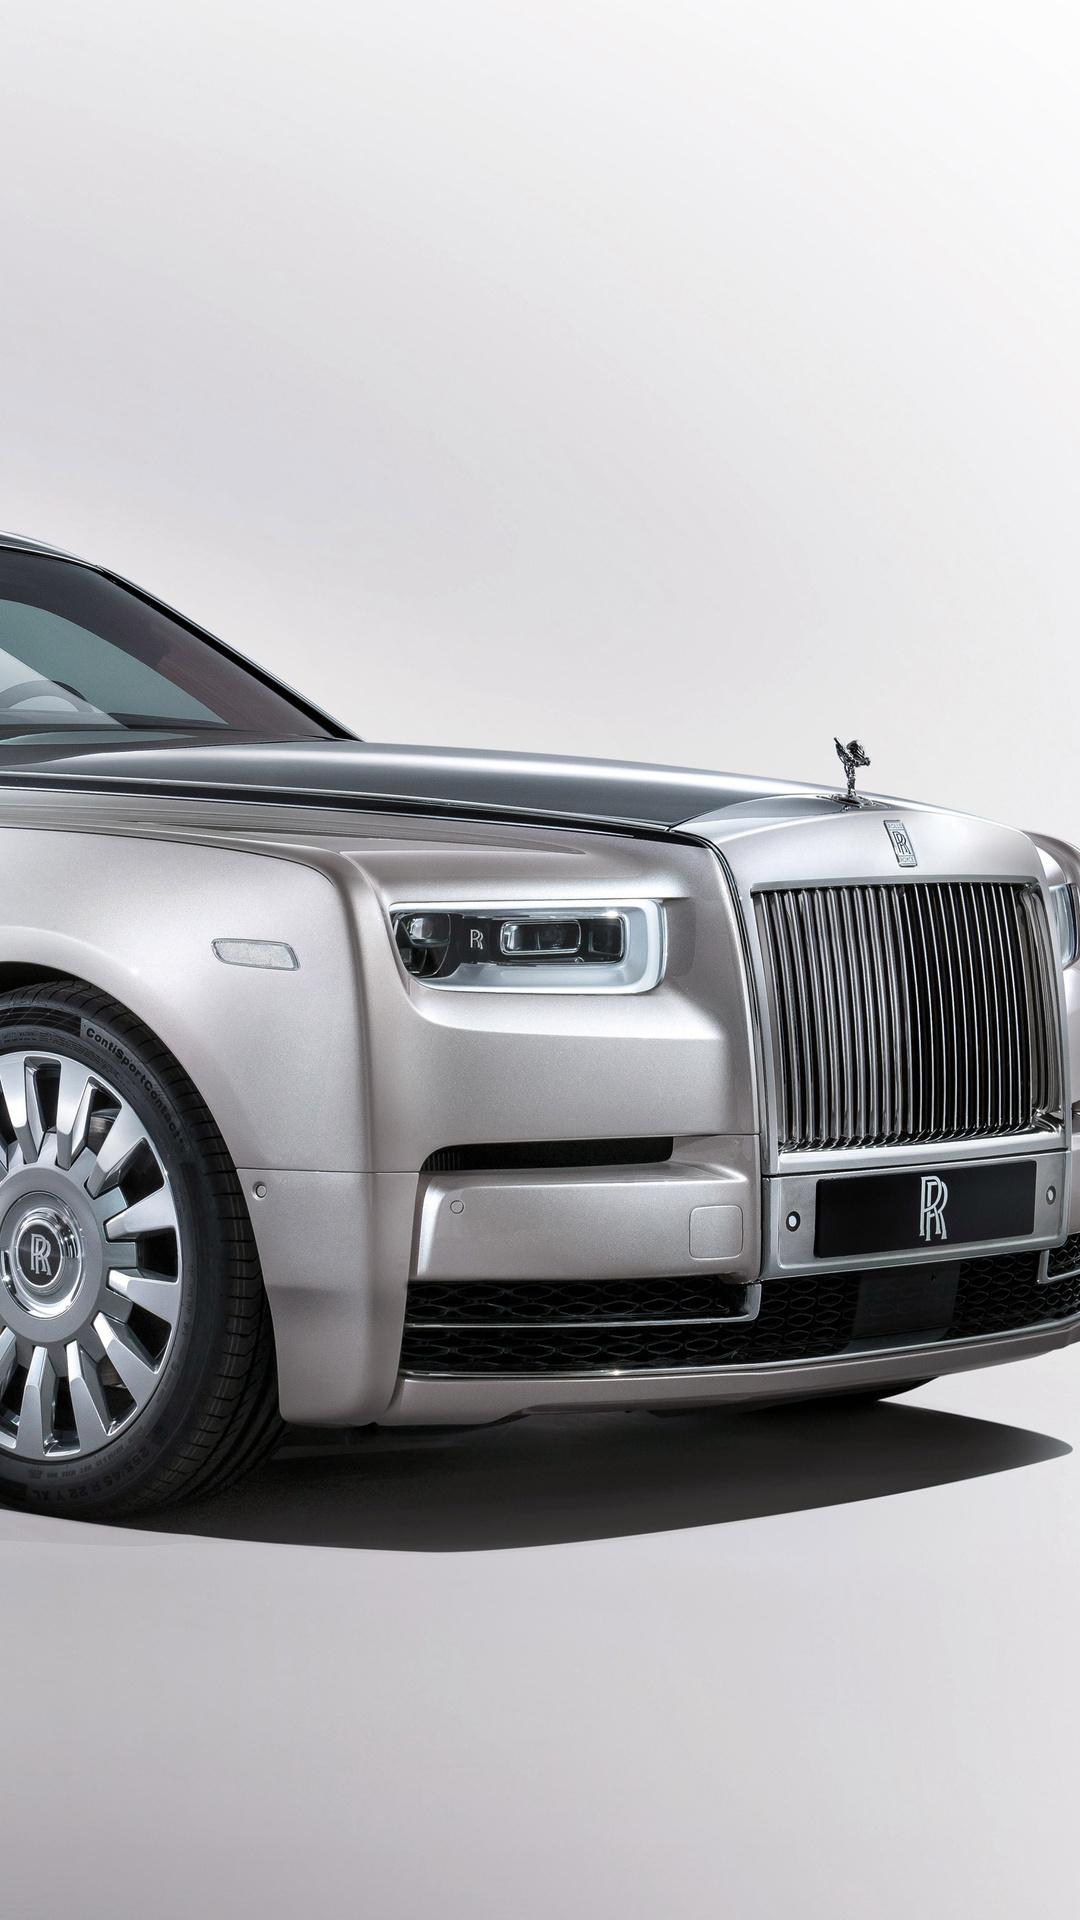 1080x1920 Rolls Royce Phantom Iphone 7 6s 6 Plus Pixel Xl One Plus